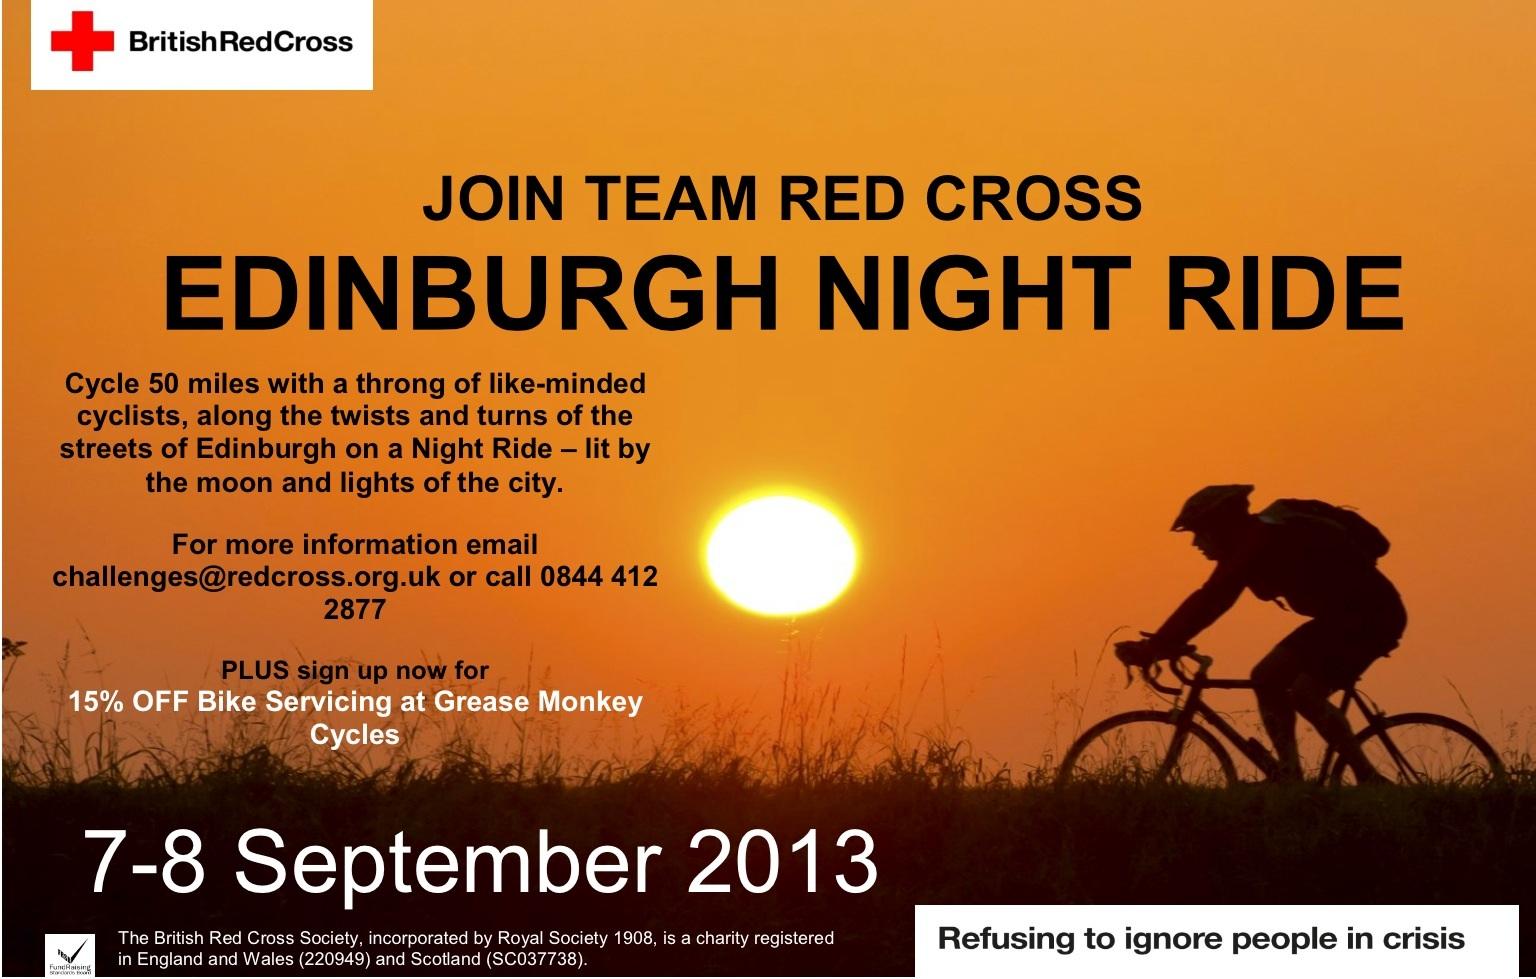 Edinburgh Night Ride 7-8 September